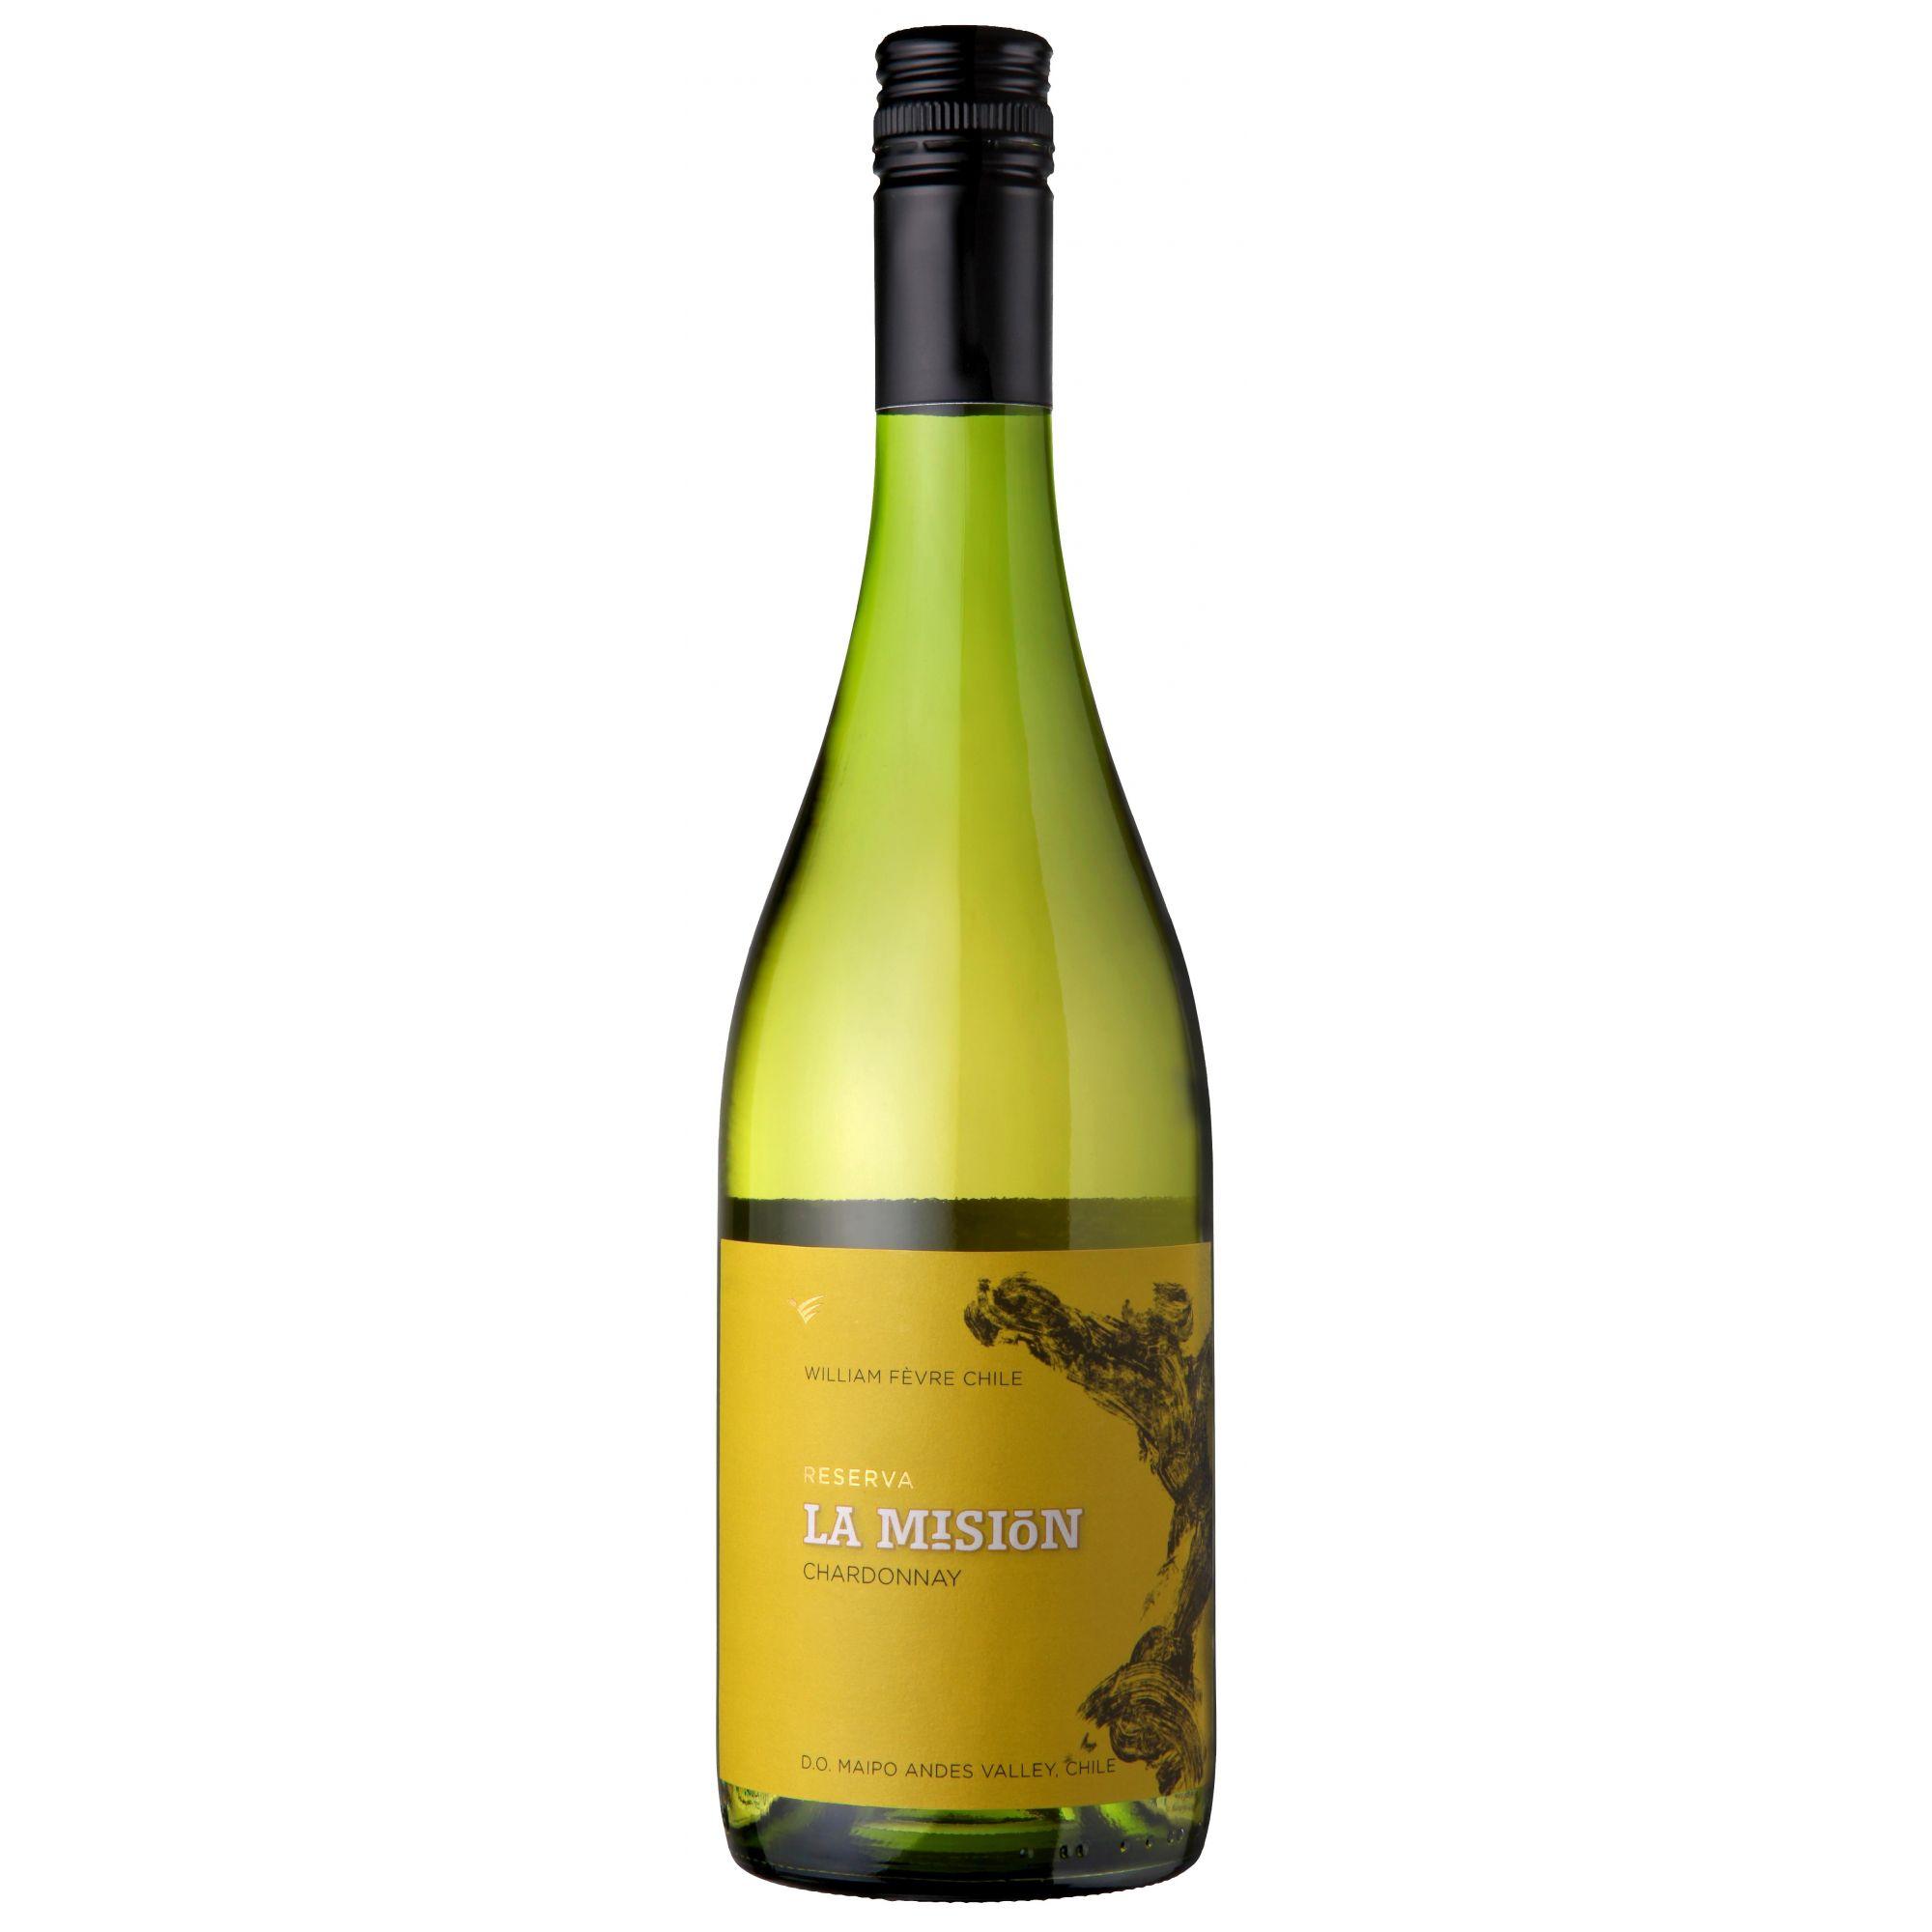 Vinho La Mision Reserva Chardonnay